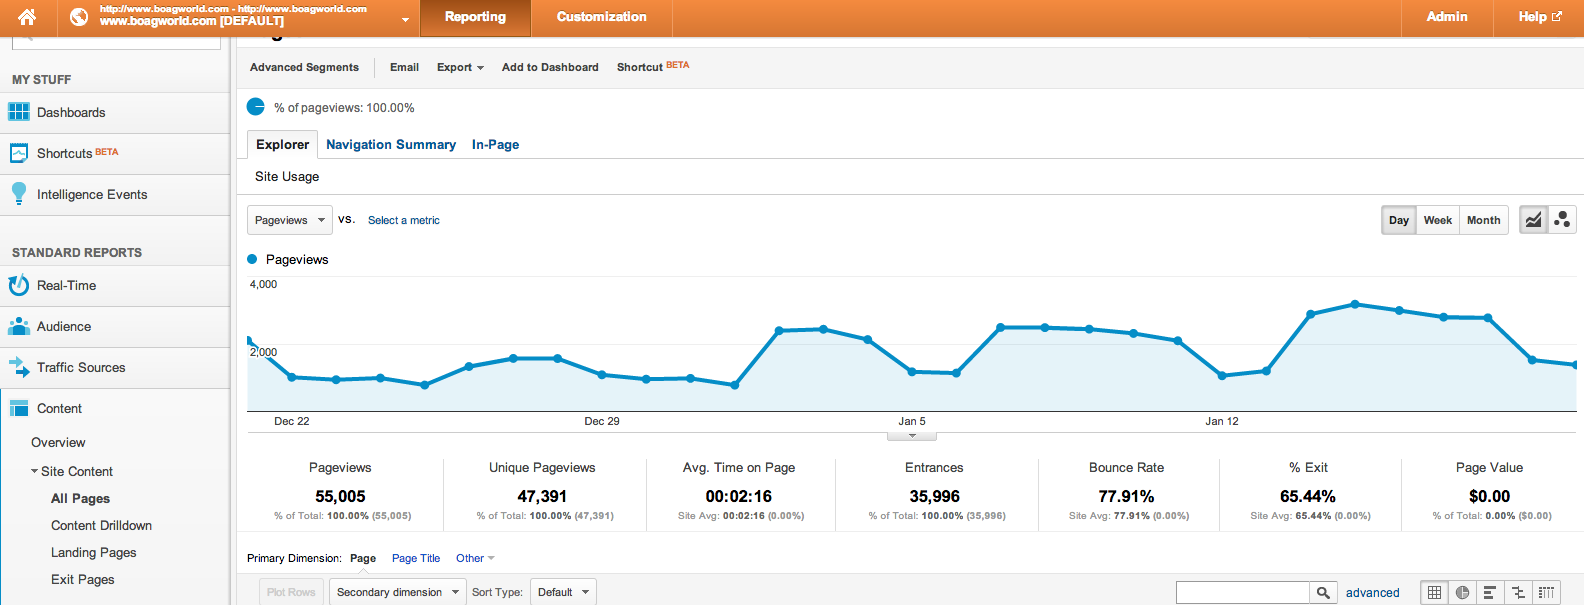 Google Analytics site content view